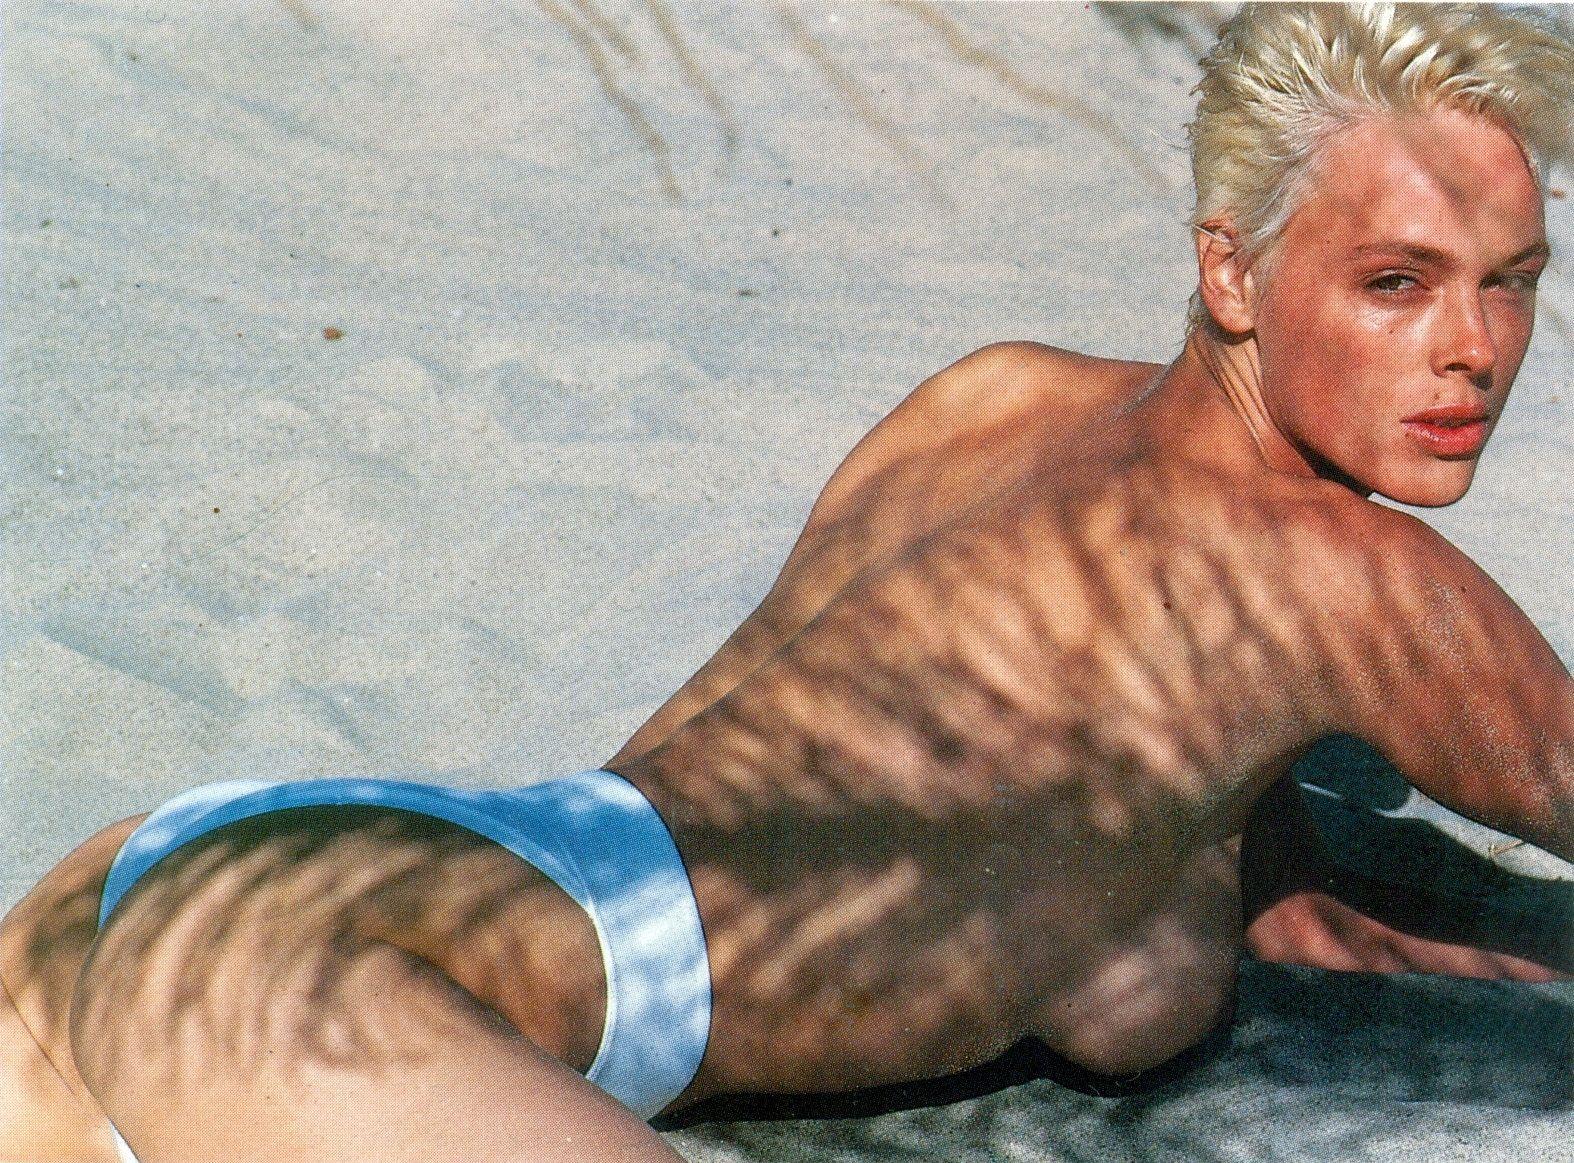 Sylvester Stallone Nude | Hot Girl HD Wallpaper